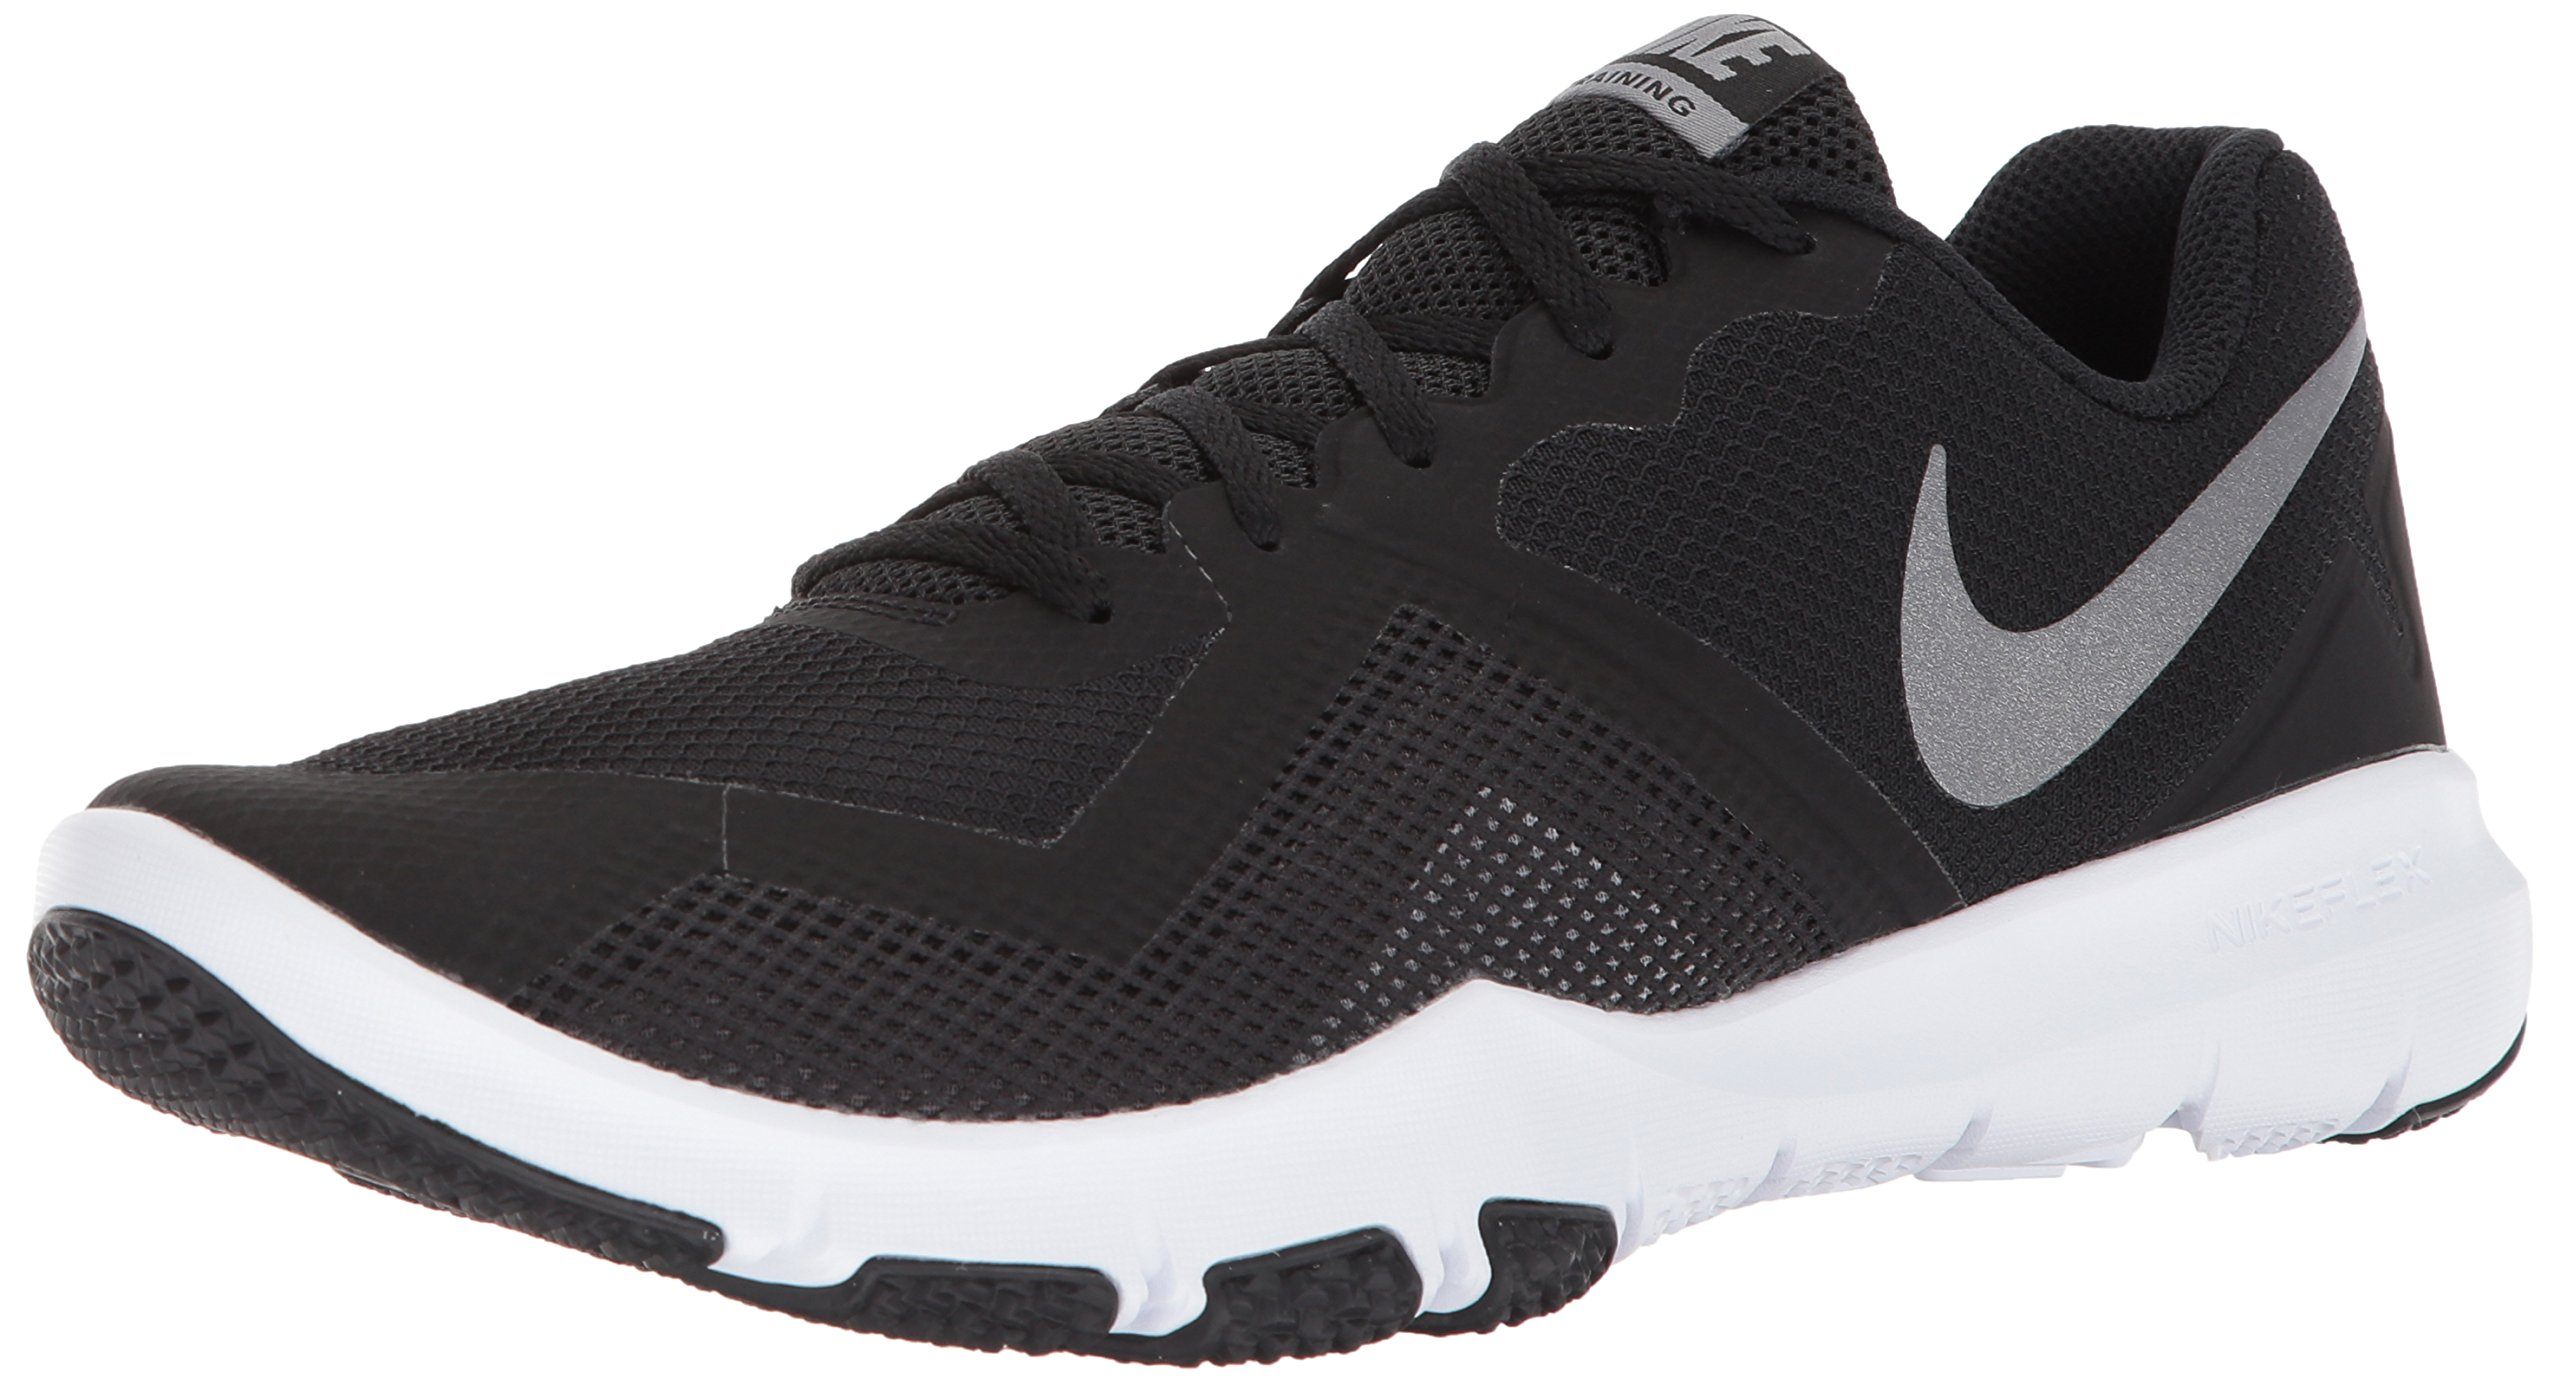 Nike Men's Flex Control II Cross Trainer, Black/Metallic Cool Grey-White, 10.5 Regular US by Nike